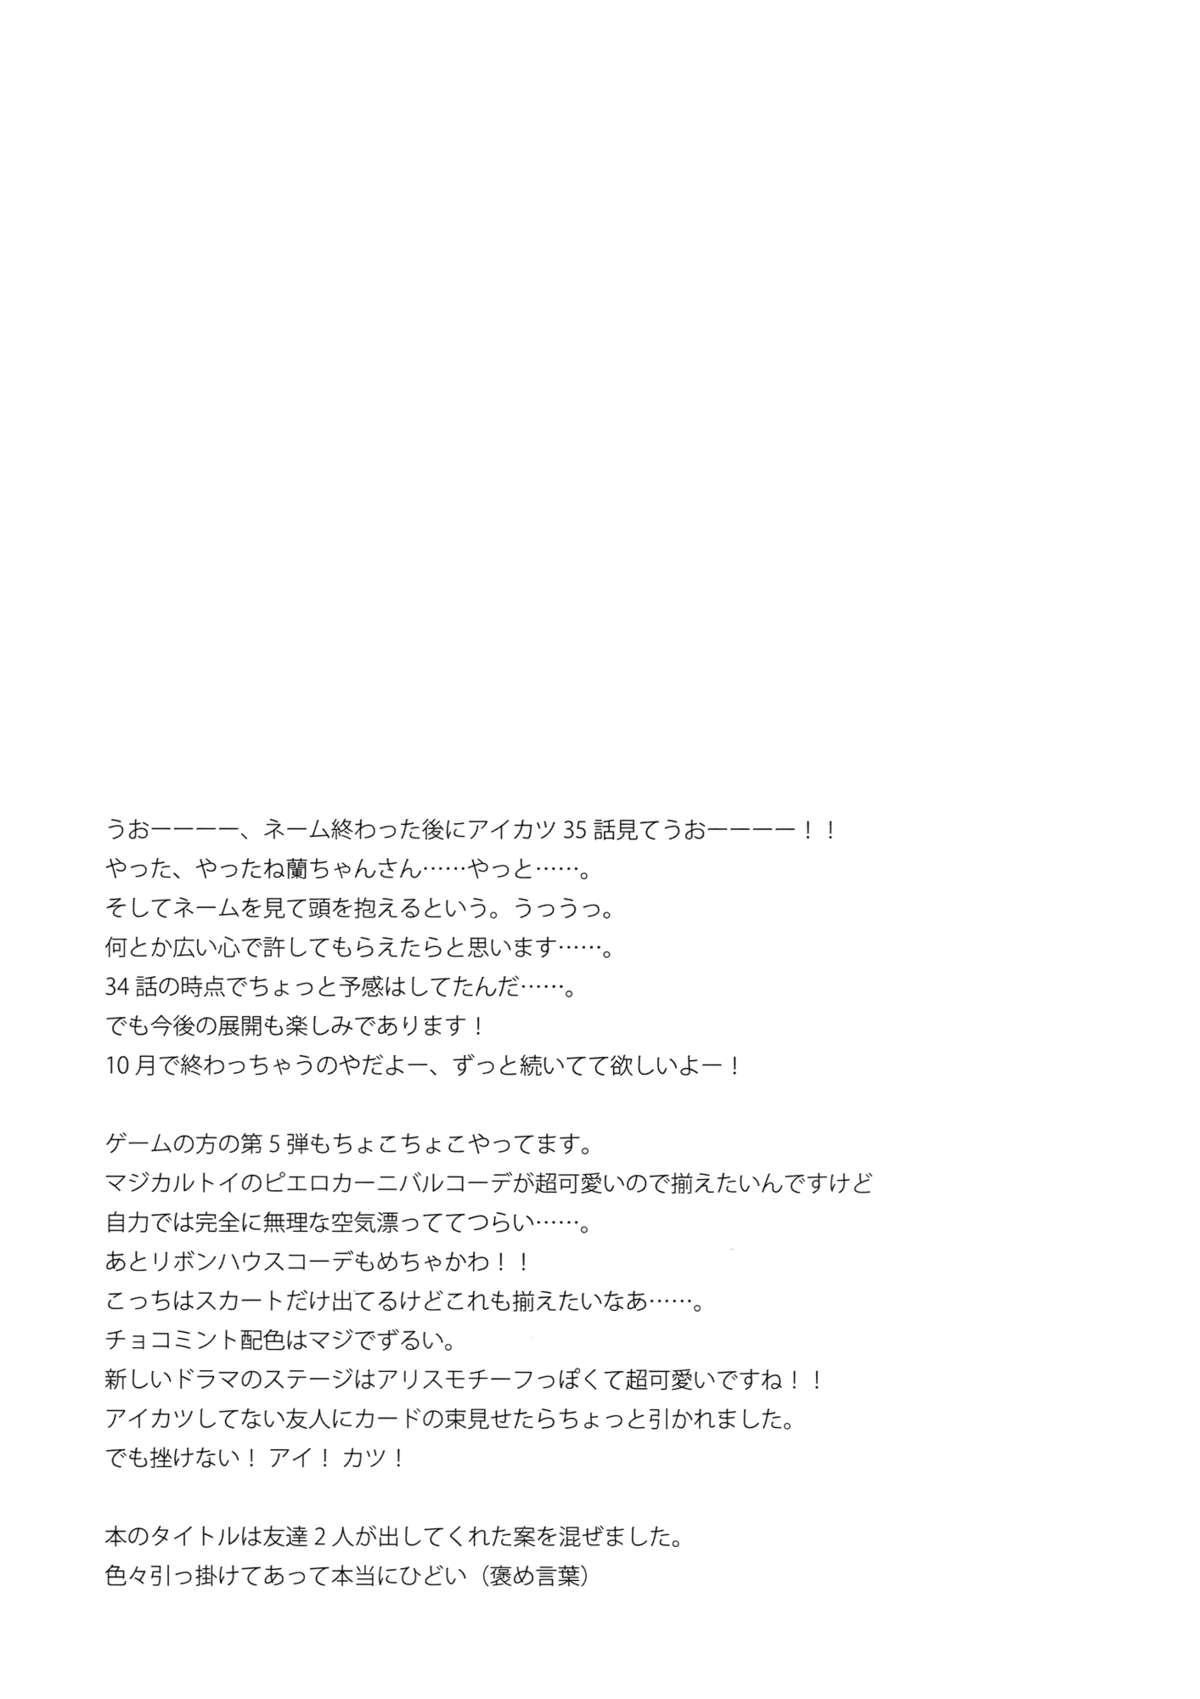 Tsukamitore! Golden Ran-Chance 23